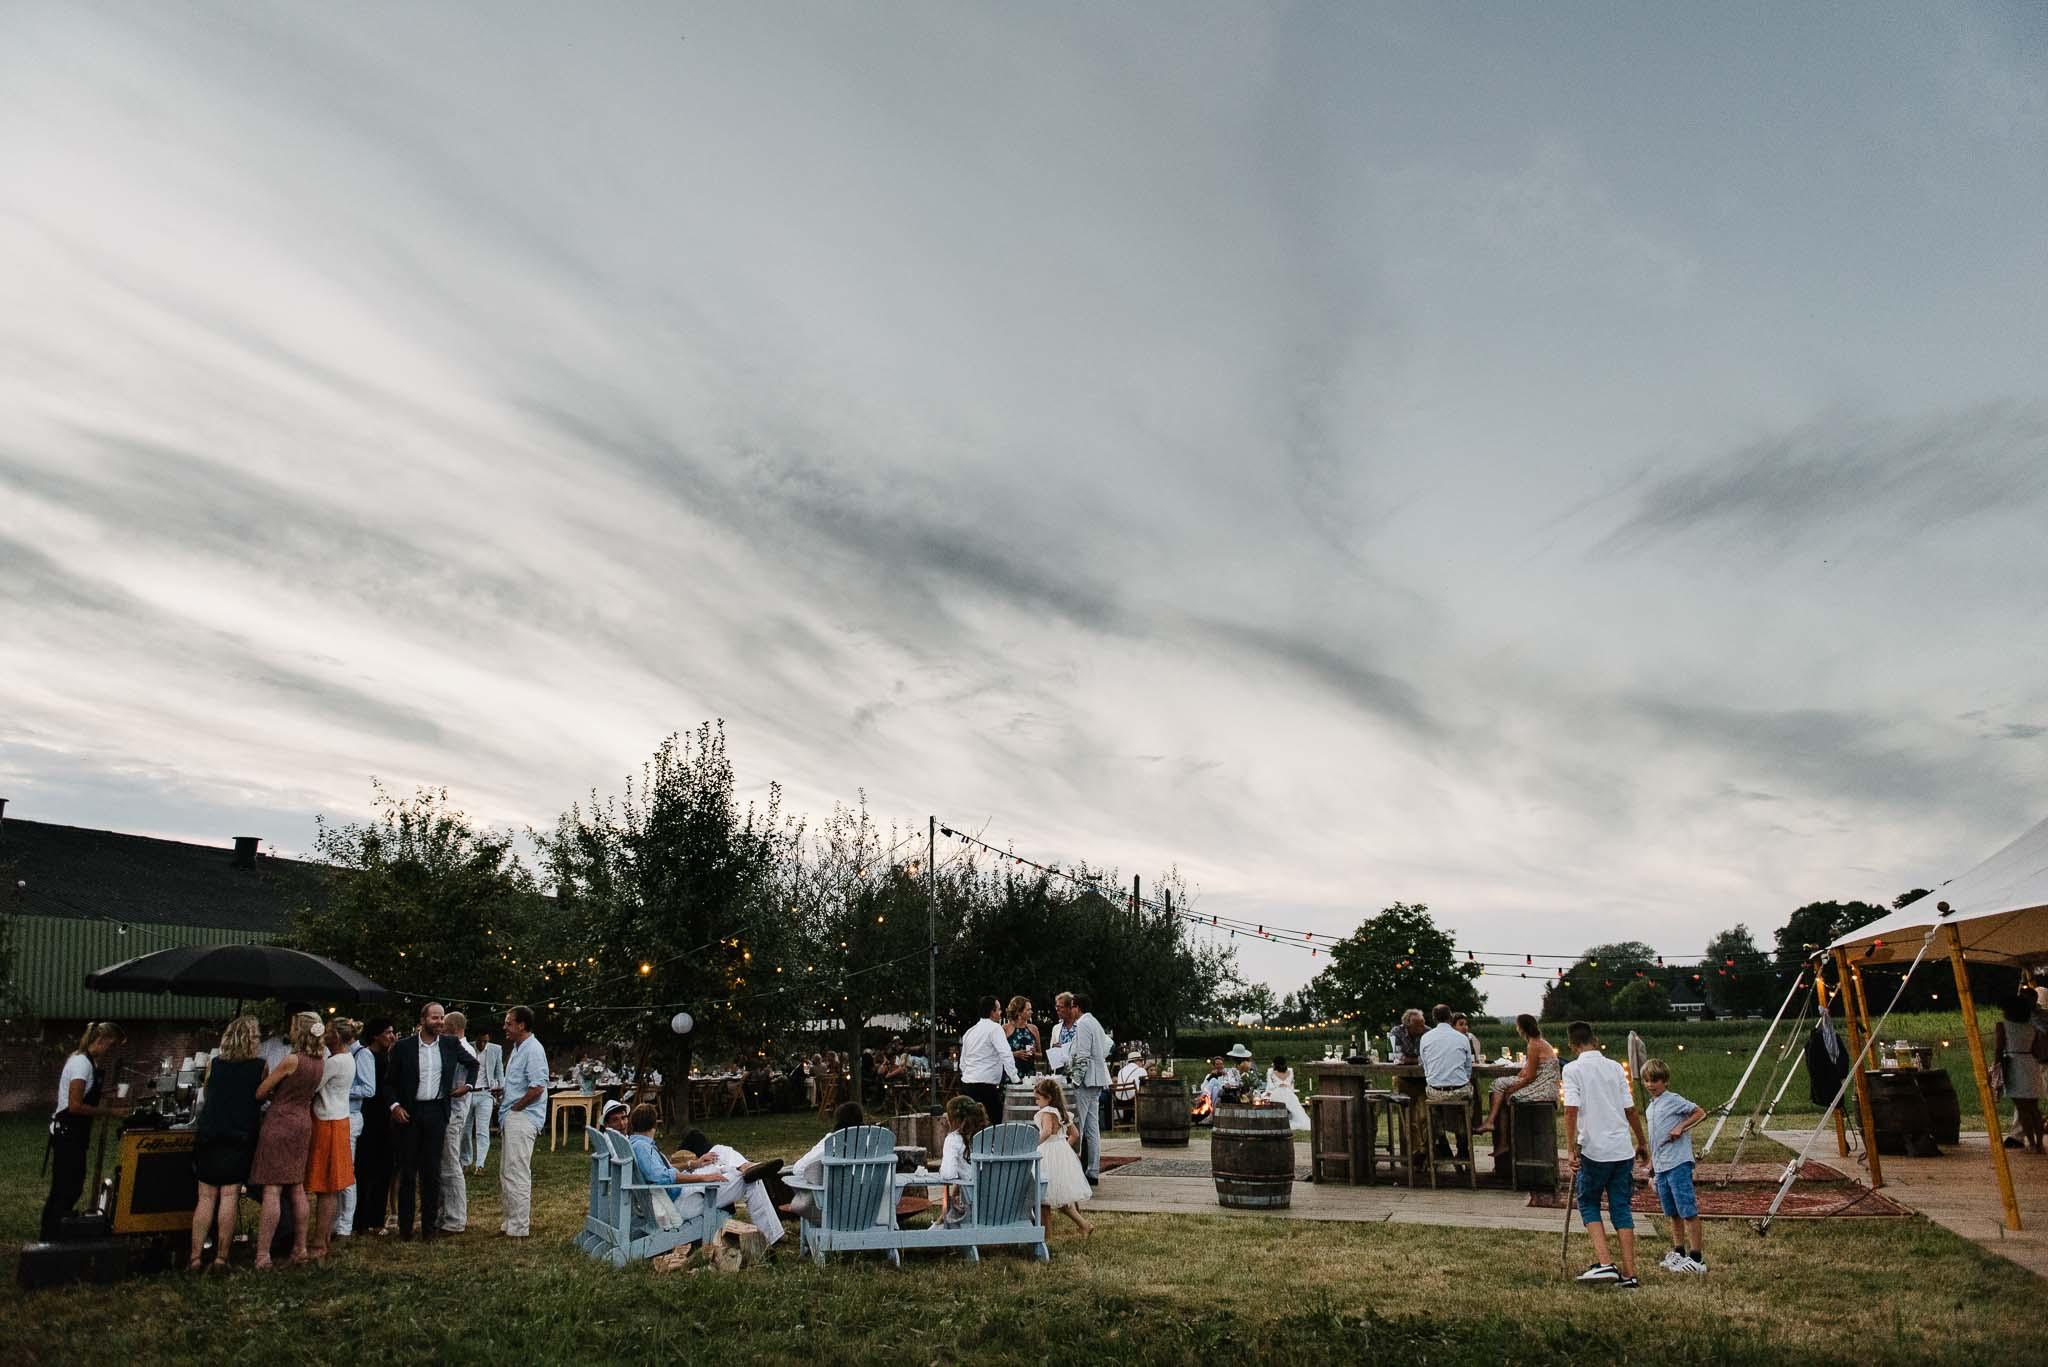 bohemian bruiloft festival stijl weiland